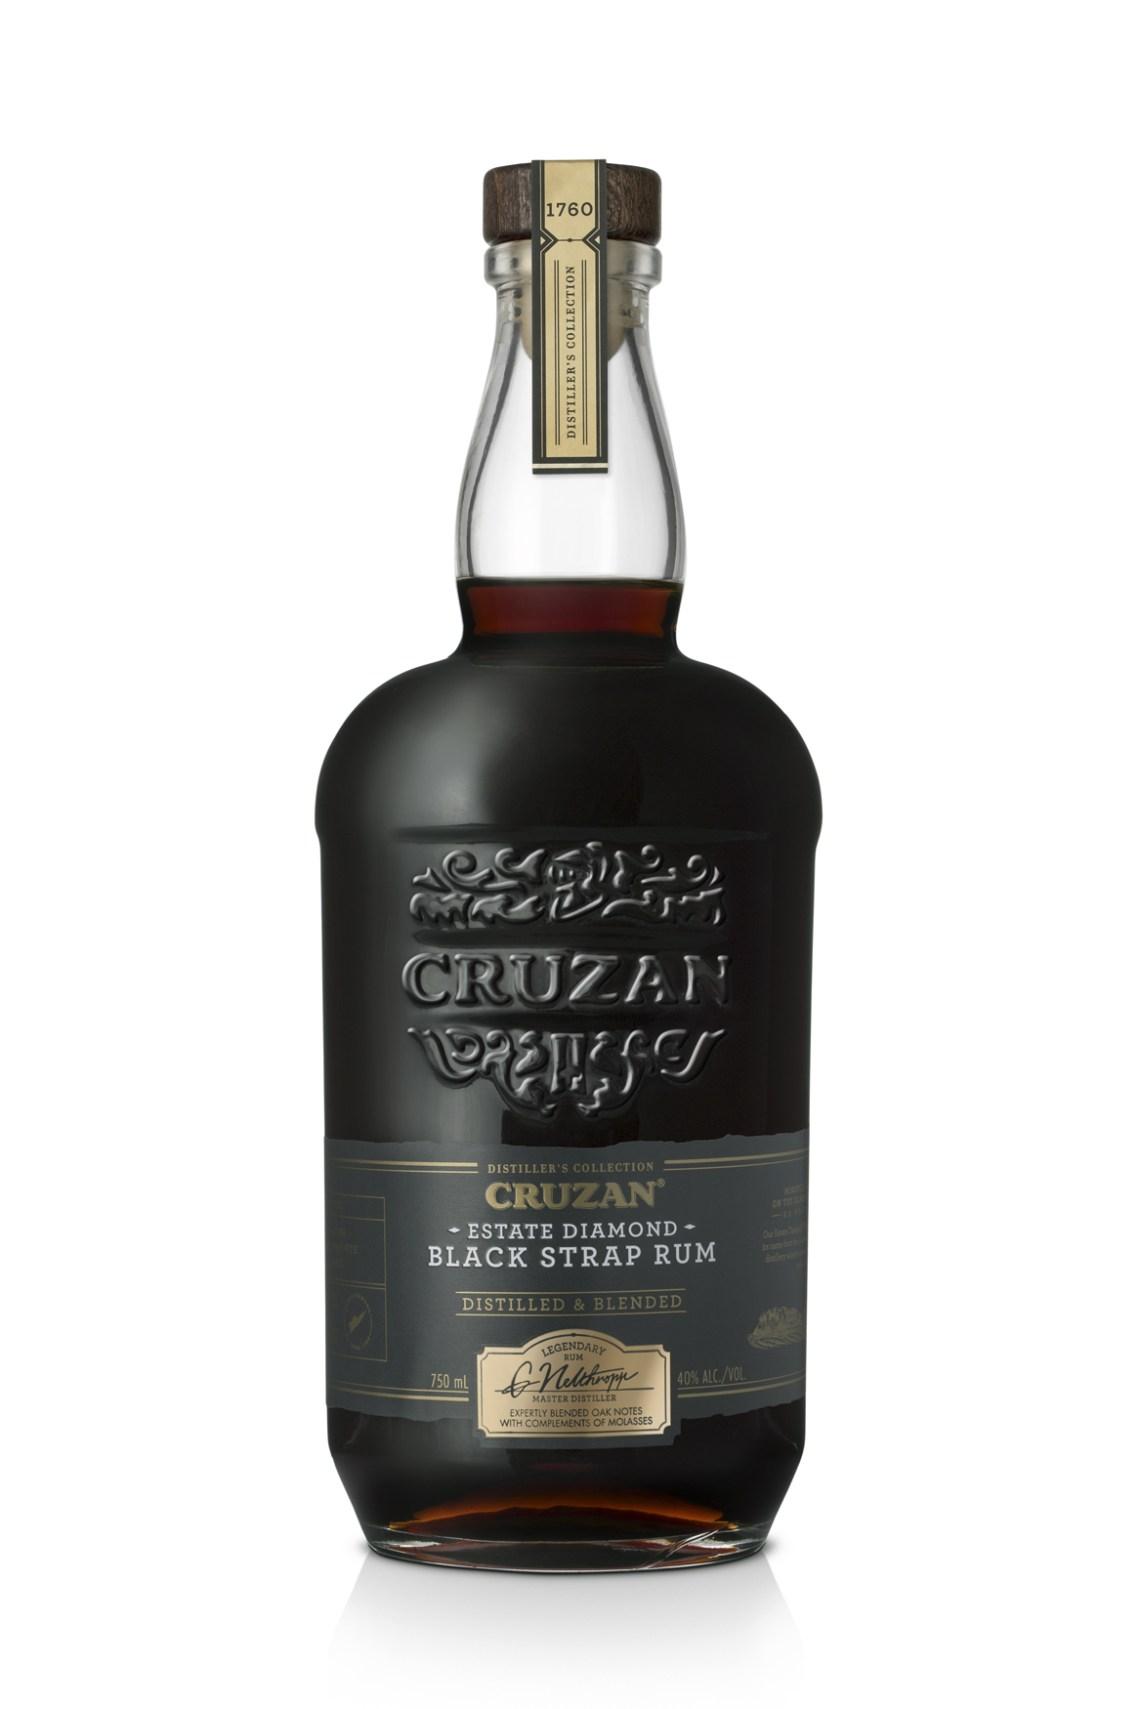 Cruzan Distiller's Collection Estate Diamond Black Strap Rum